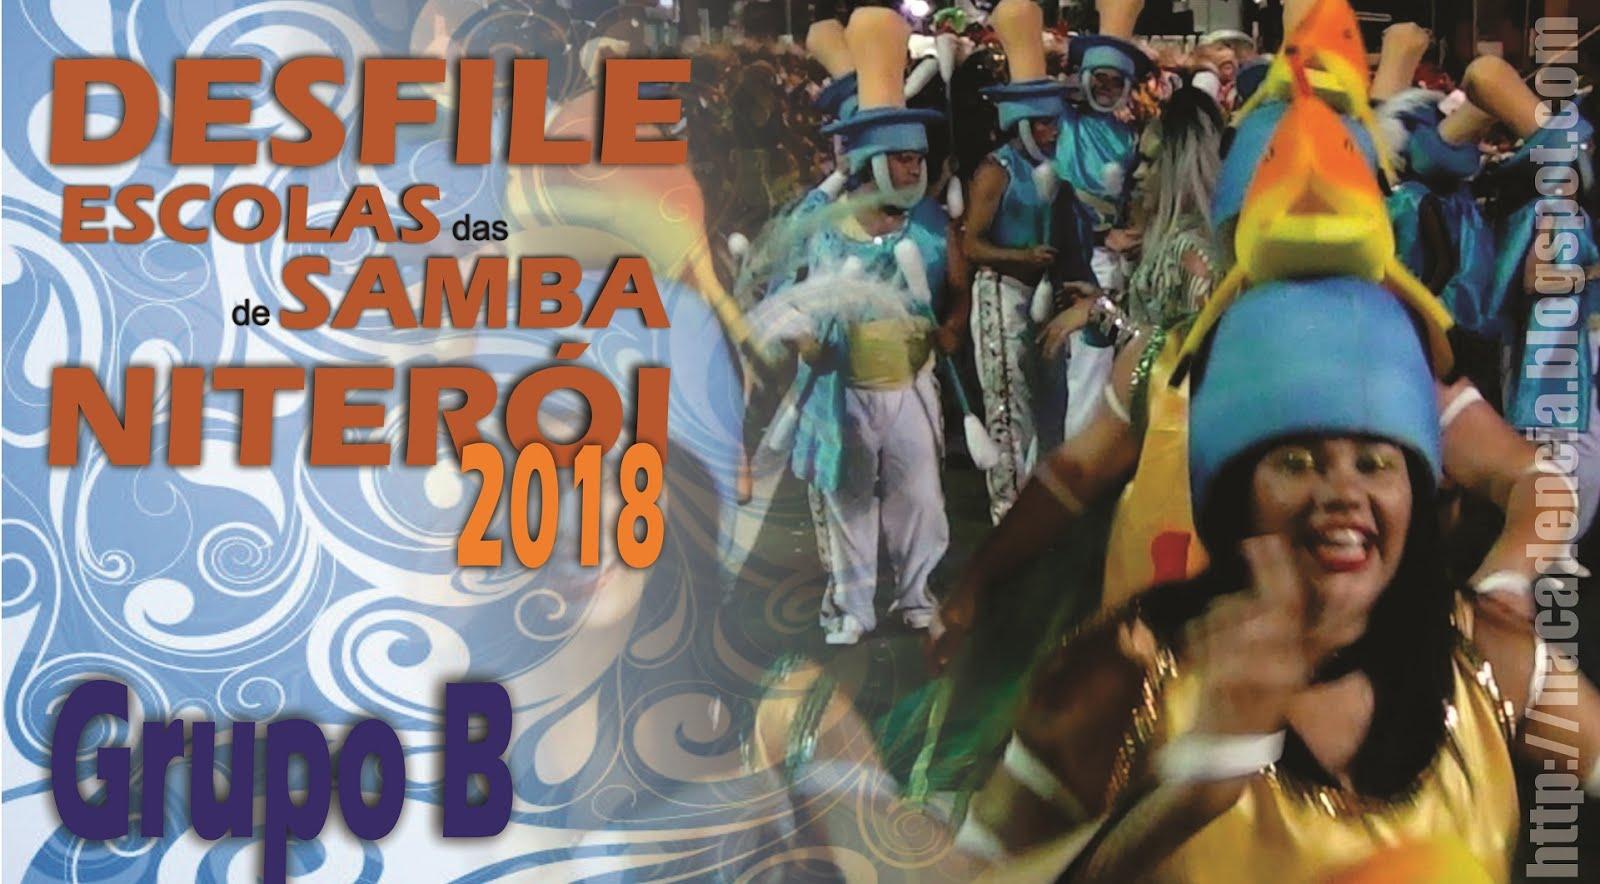 Carnaval de Niterói 2018 - Grupo B